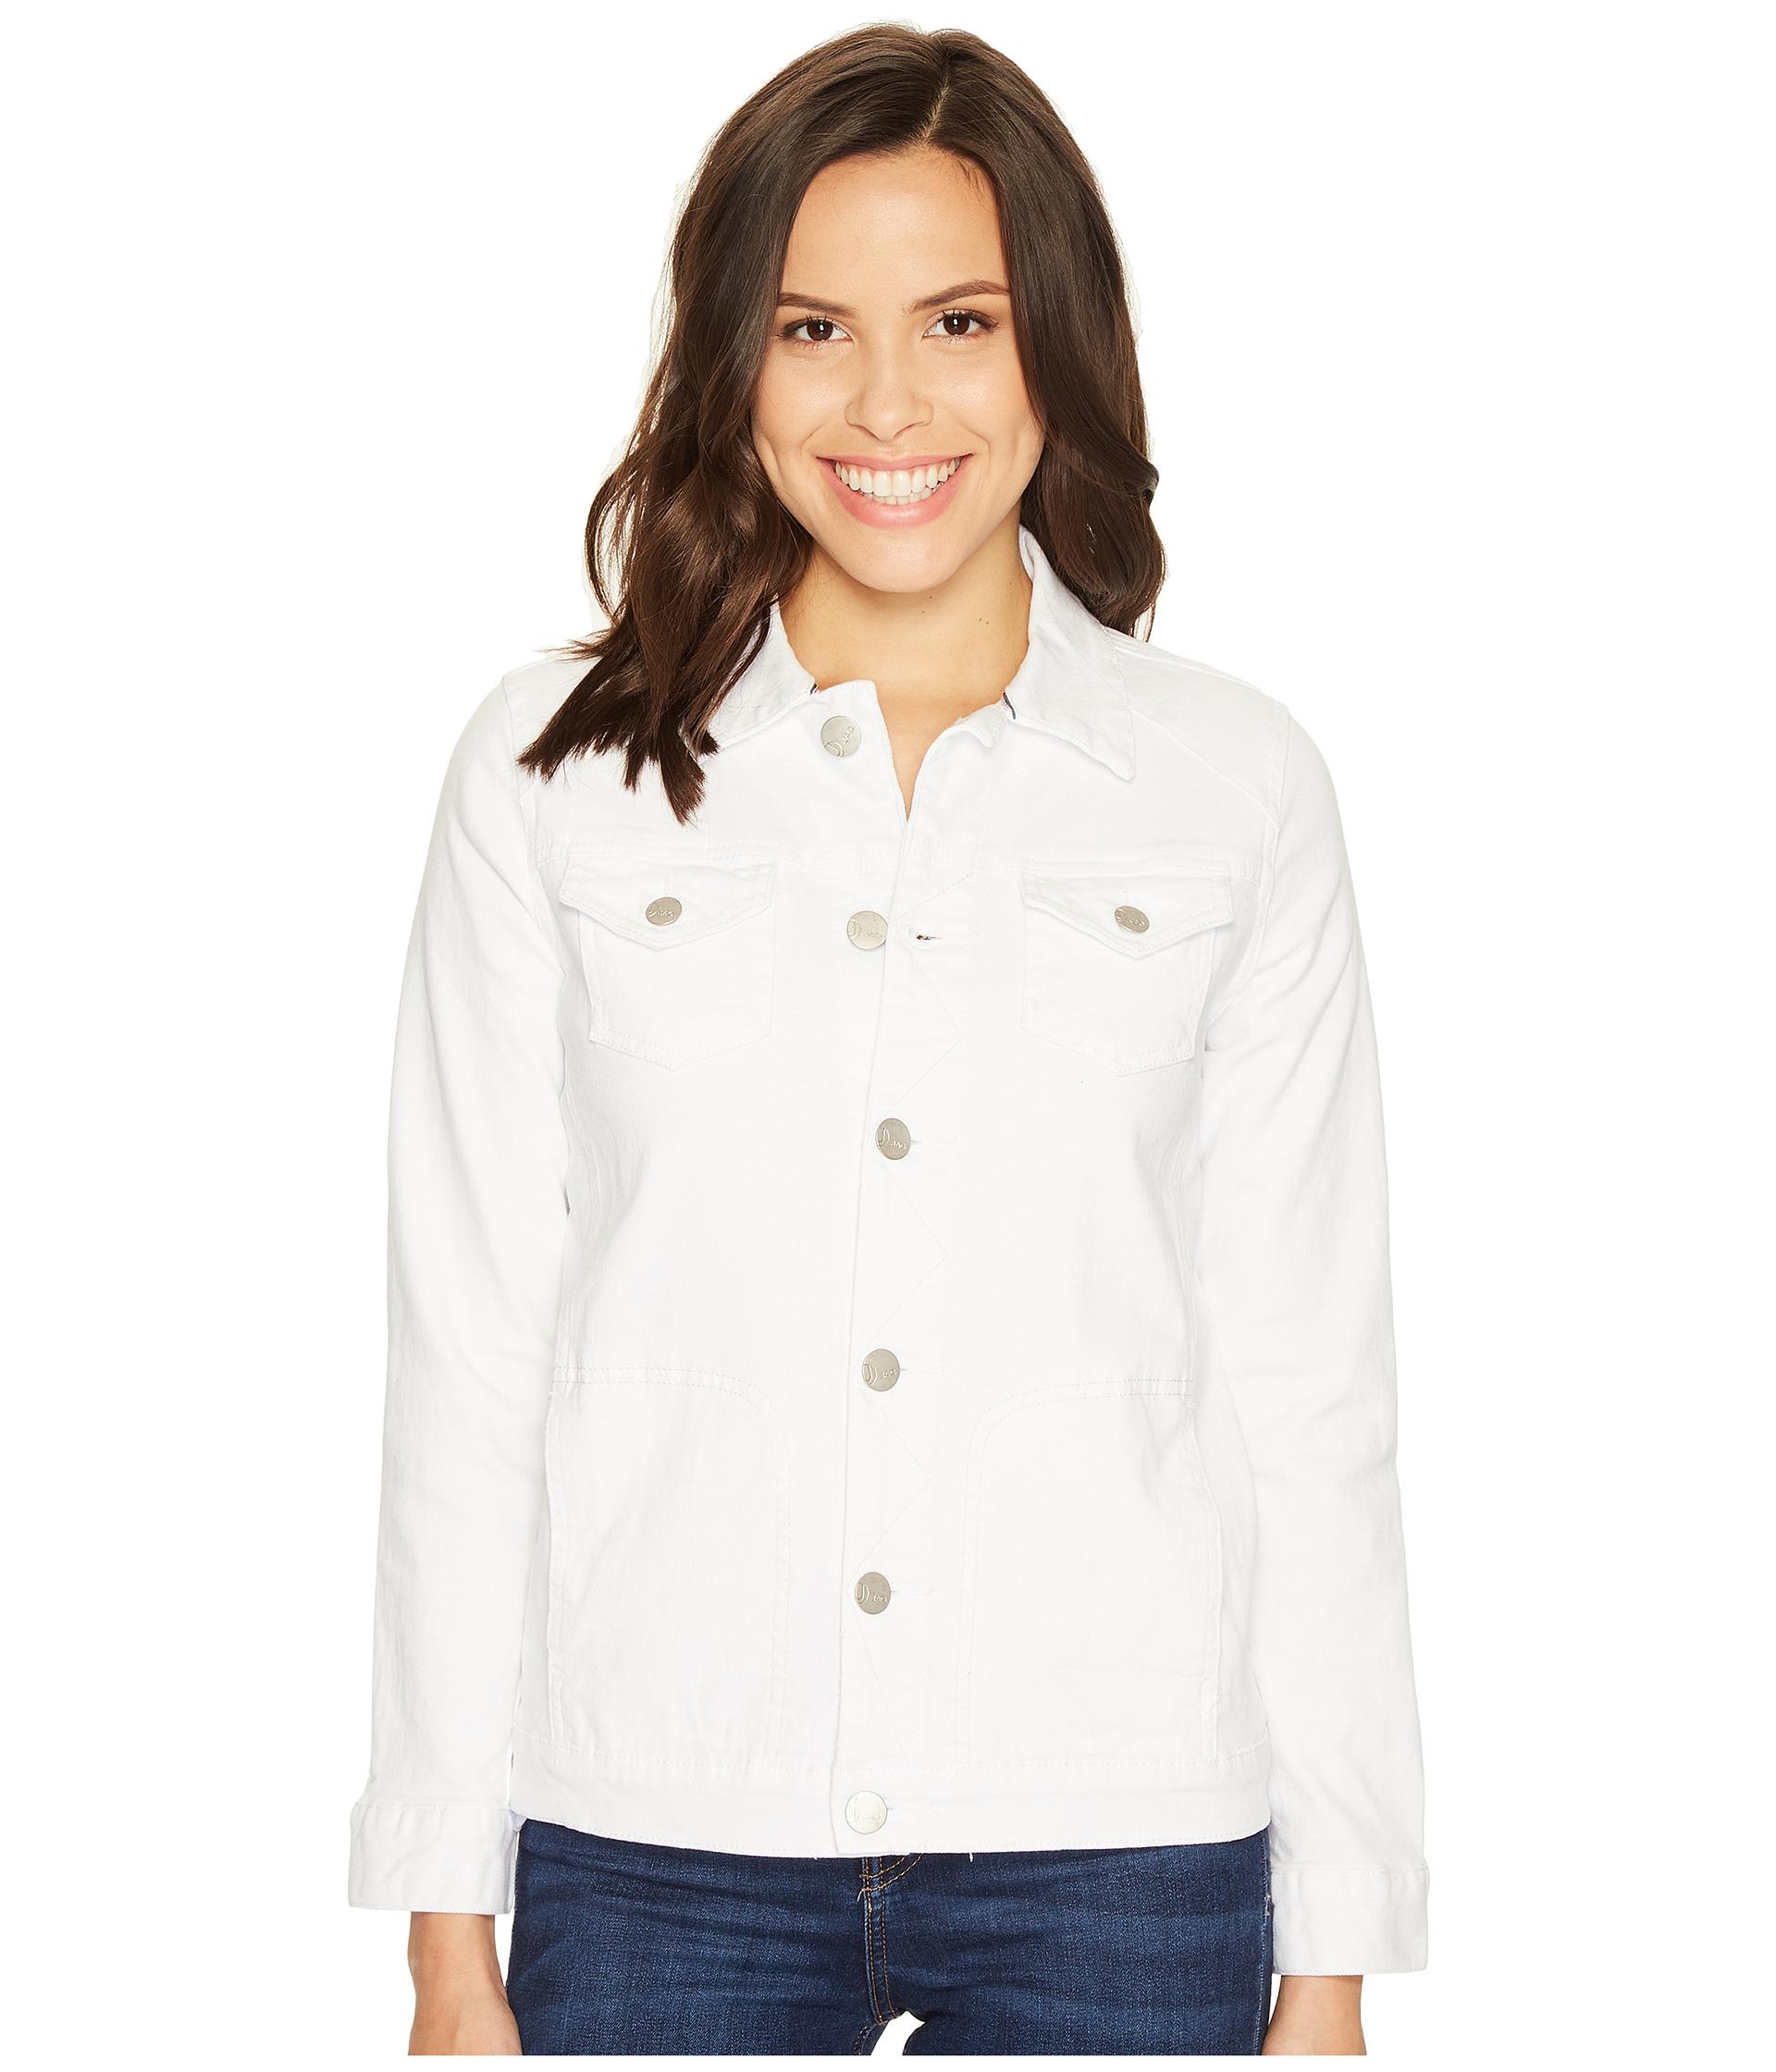 Jag Jeans Lowen Stretch Jacket in White Denim - Zappos.com Free Shipping BOTH Ways